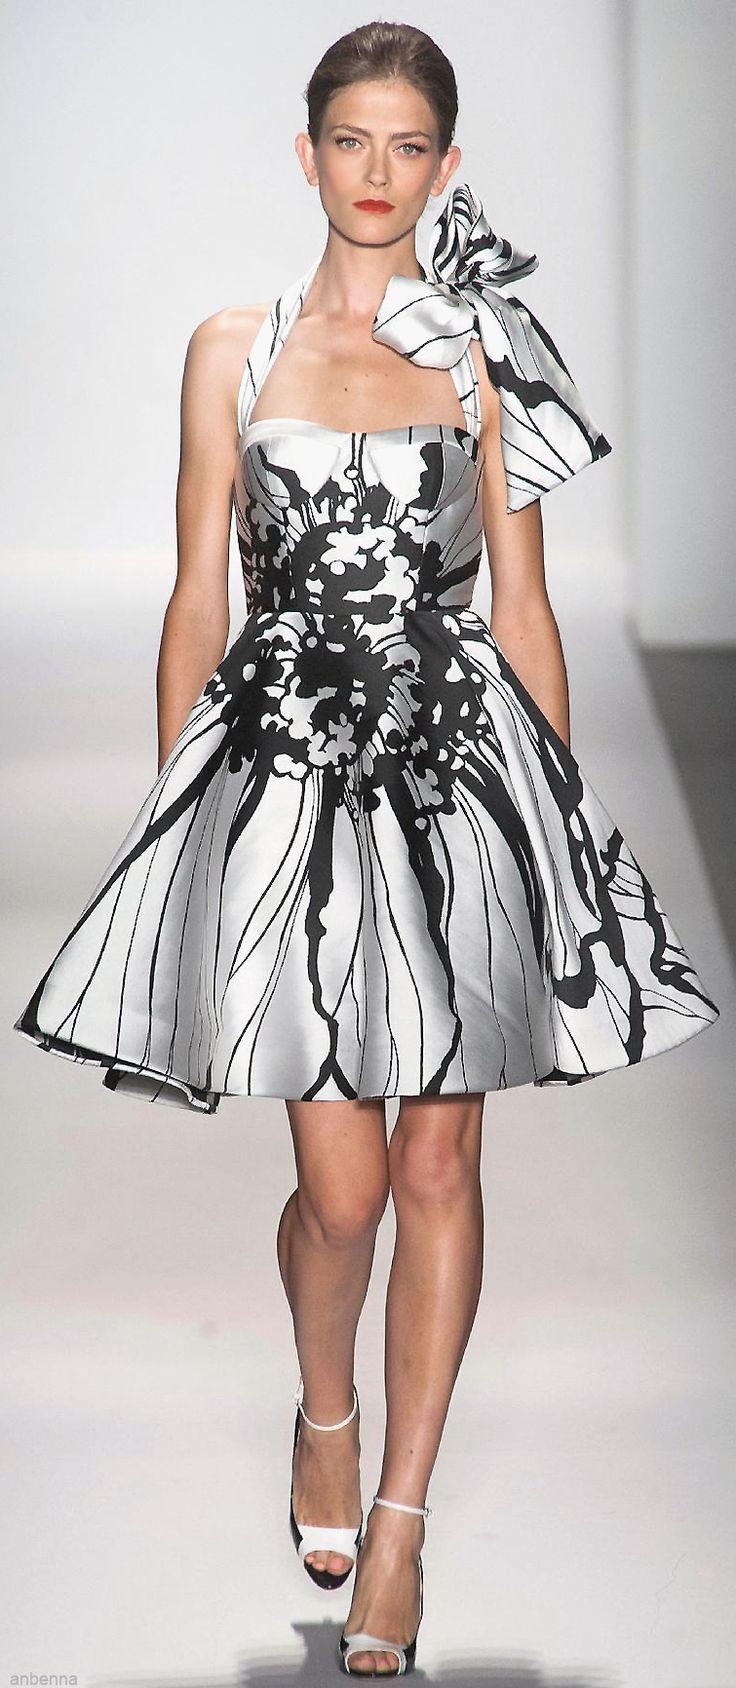 best siyahbeyaz images on pinterest high fashion sweet dress